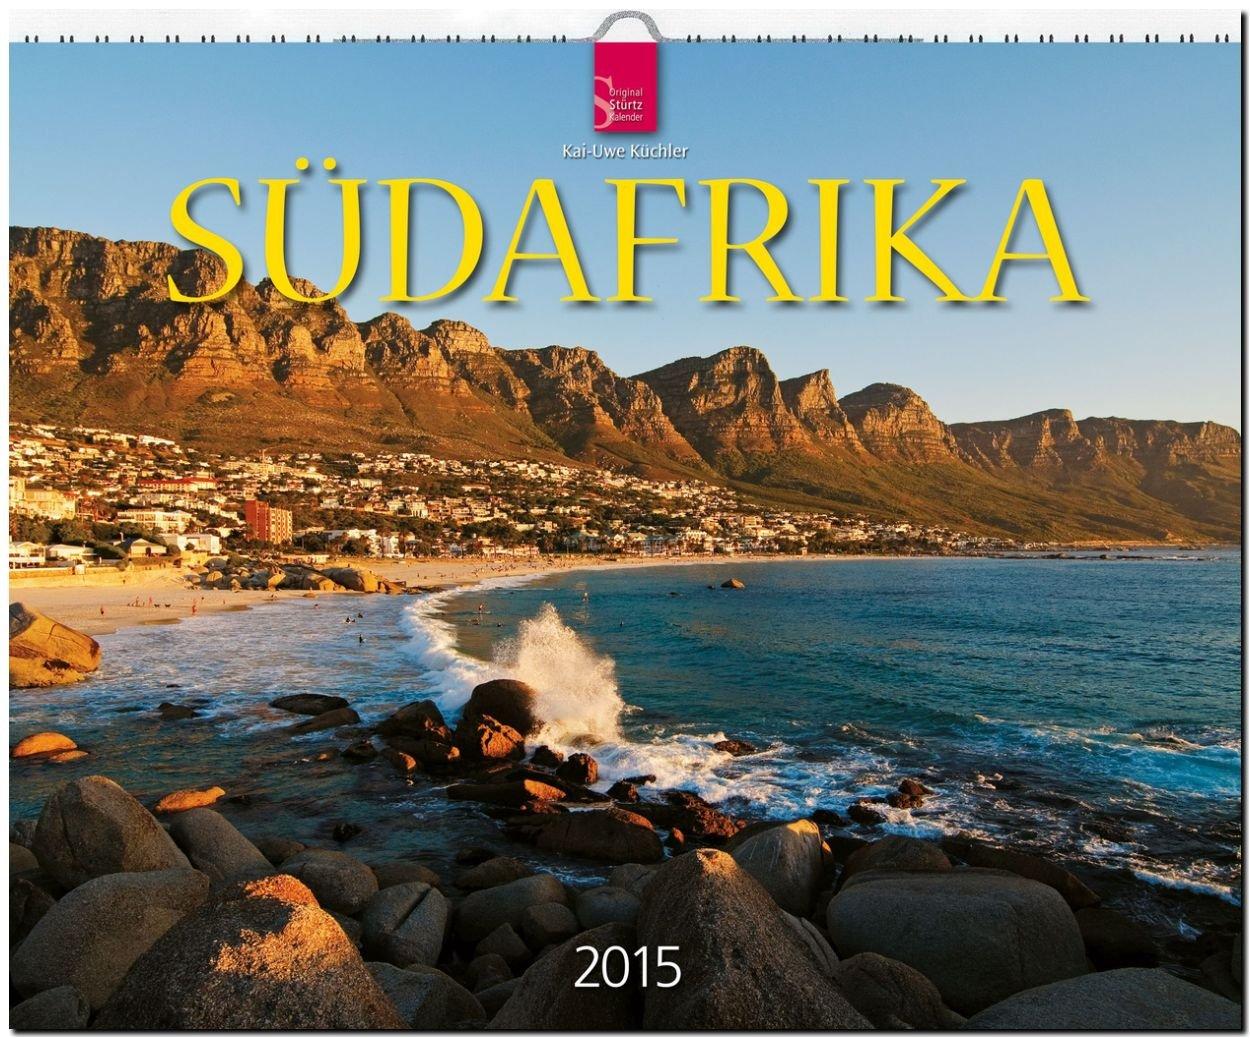 Südafrika 2015 - Original Stürtz-Kalender - Großformat-Kalender 60 x 48 cm